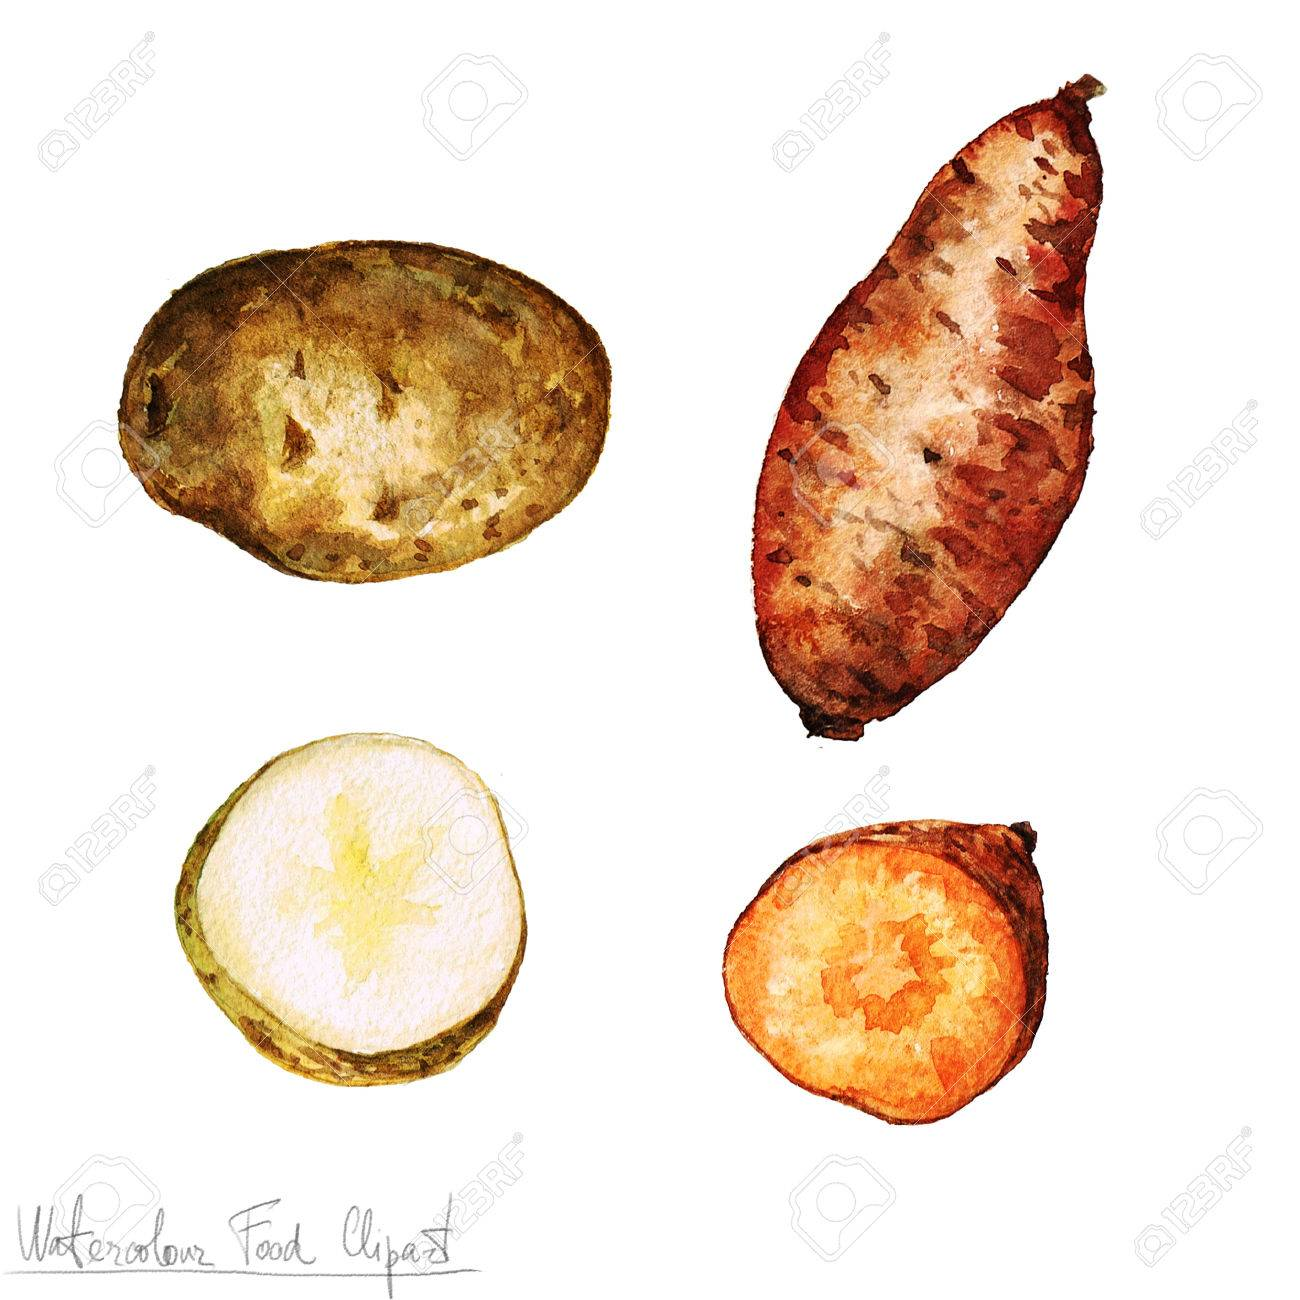 Watercolor Food Clipart - Potato - 53245598